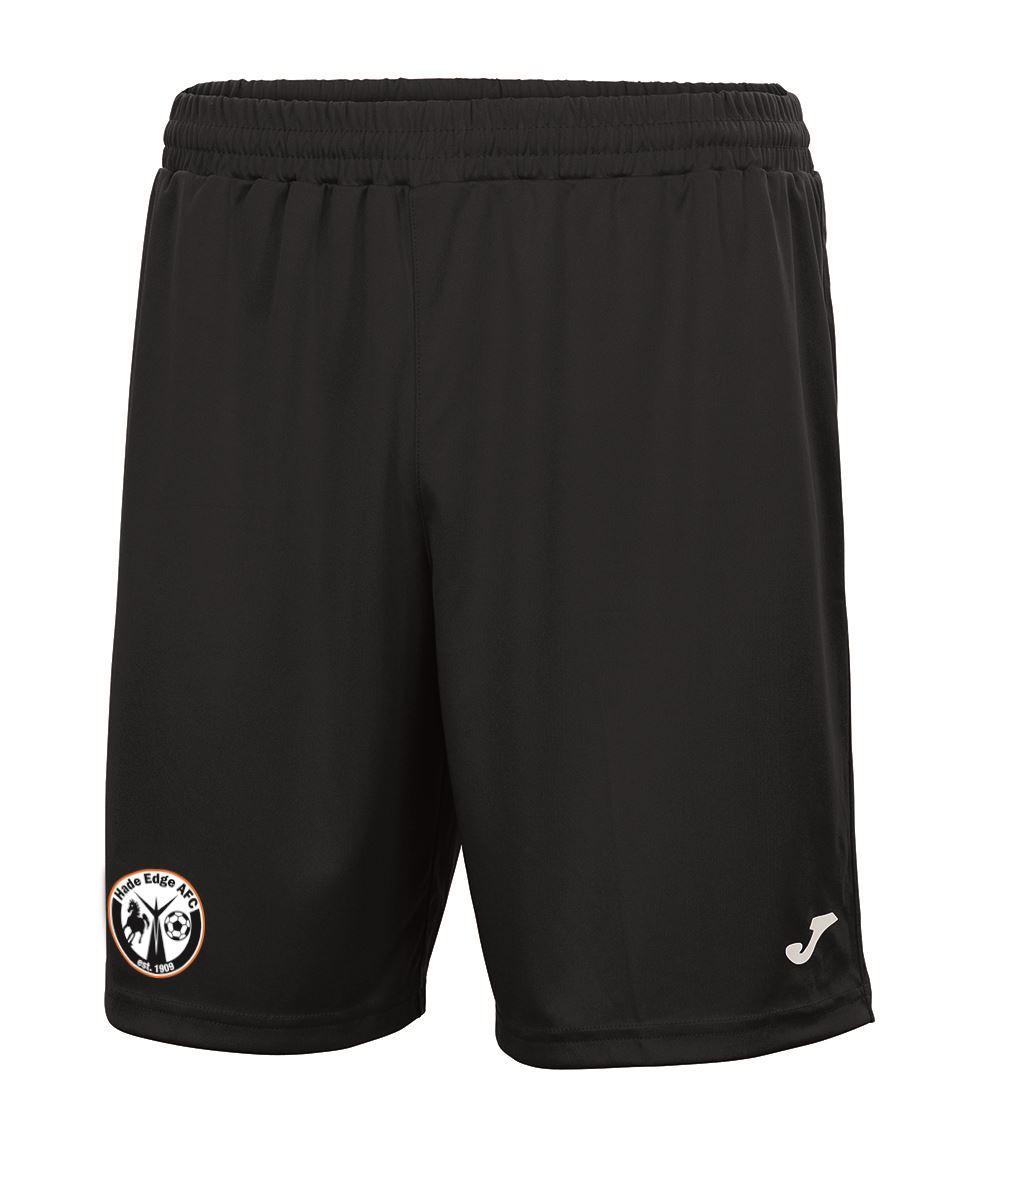 Hade Edge Adult Training Shorts